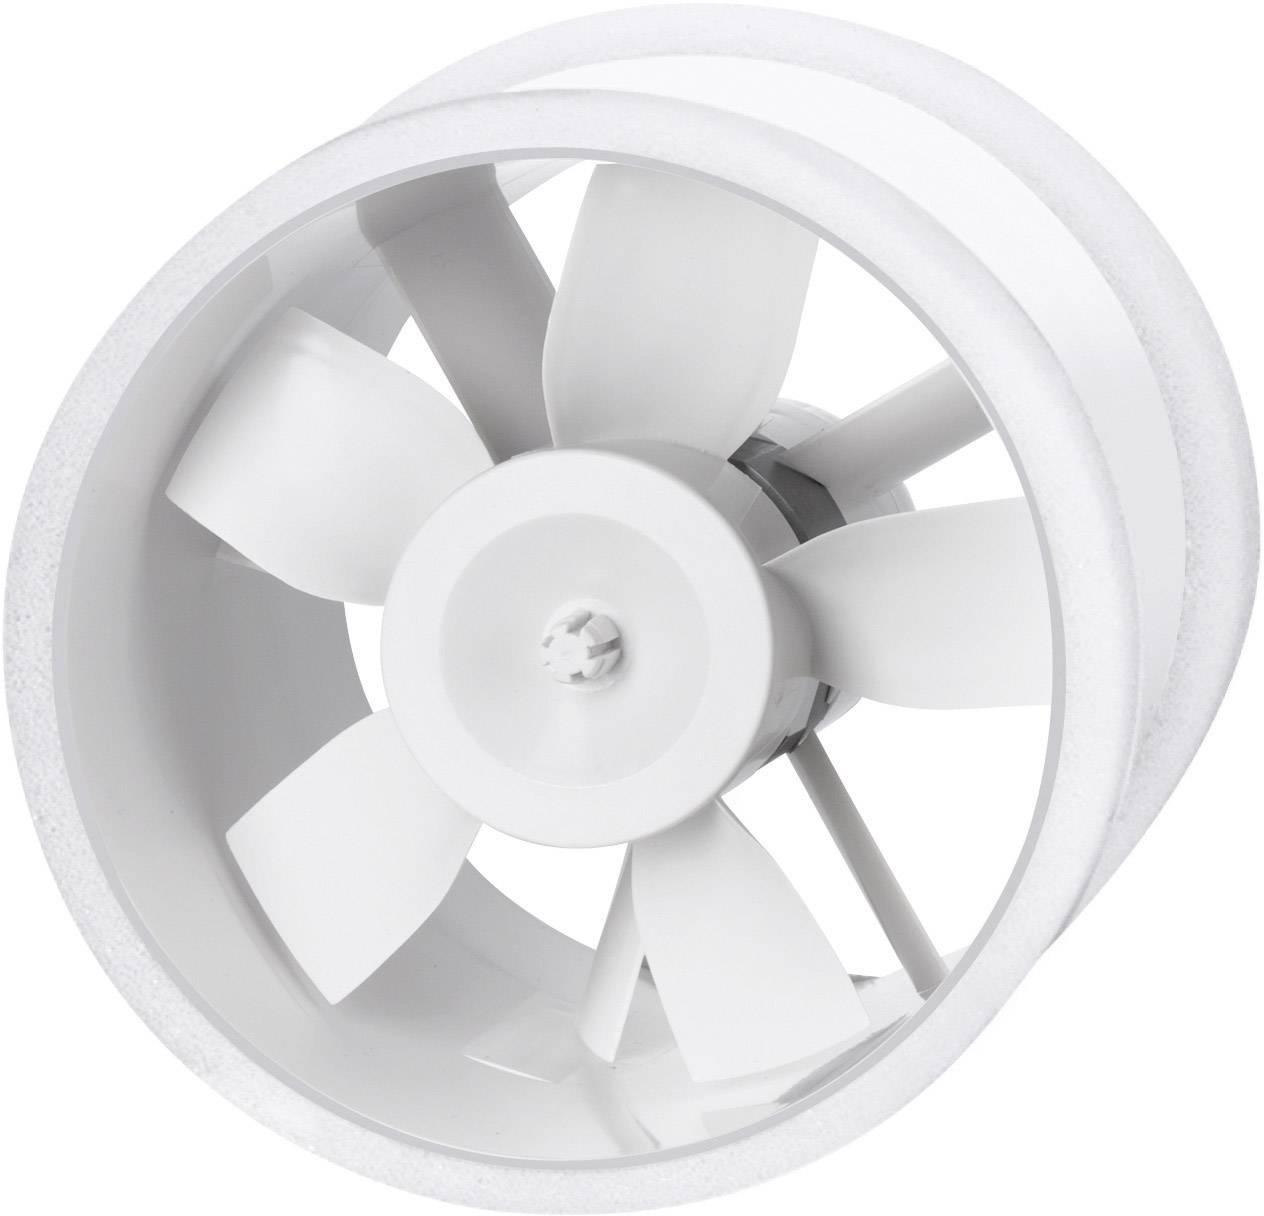 Ventilátor do potrubí Sygonix, 256 m³/h, 150 mm, bílá